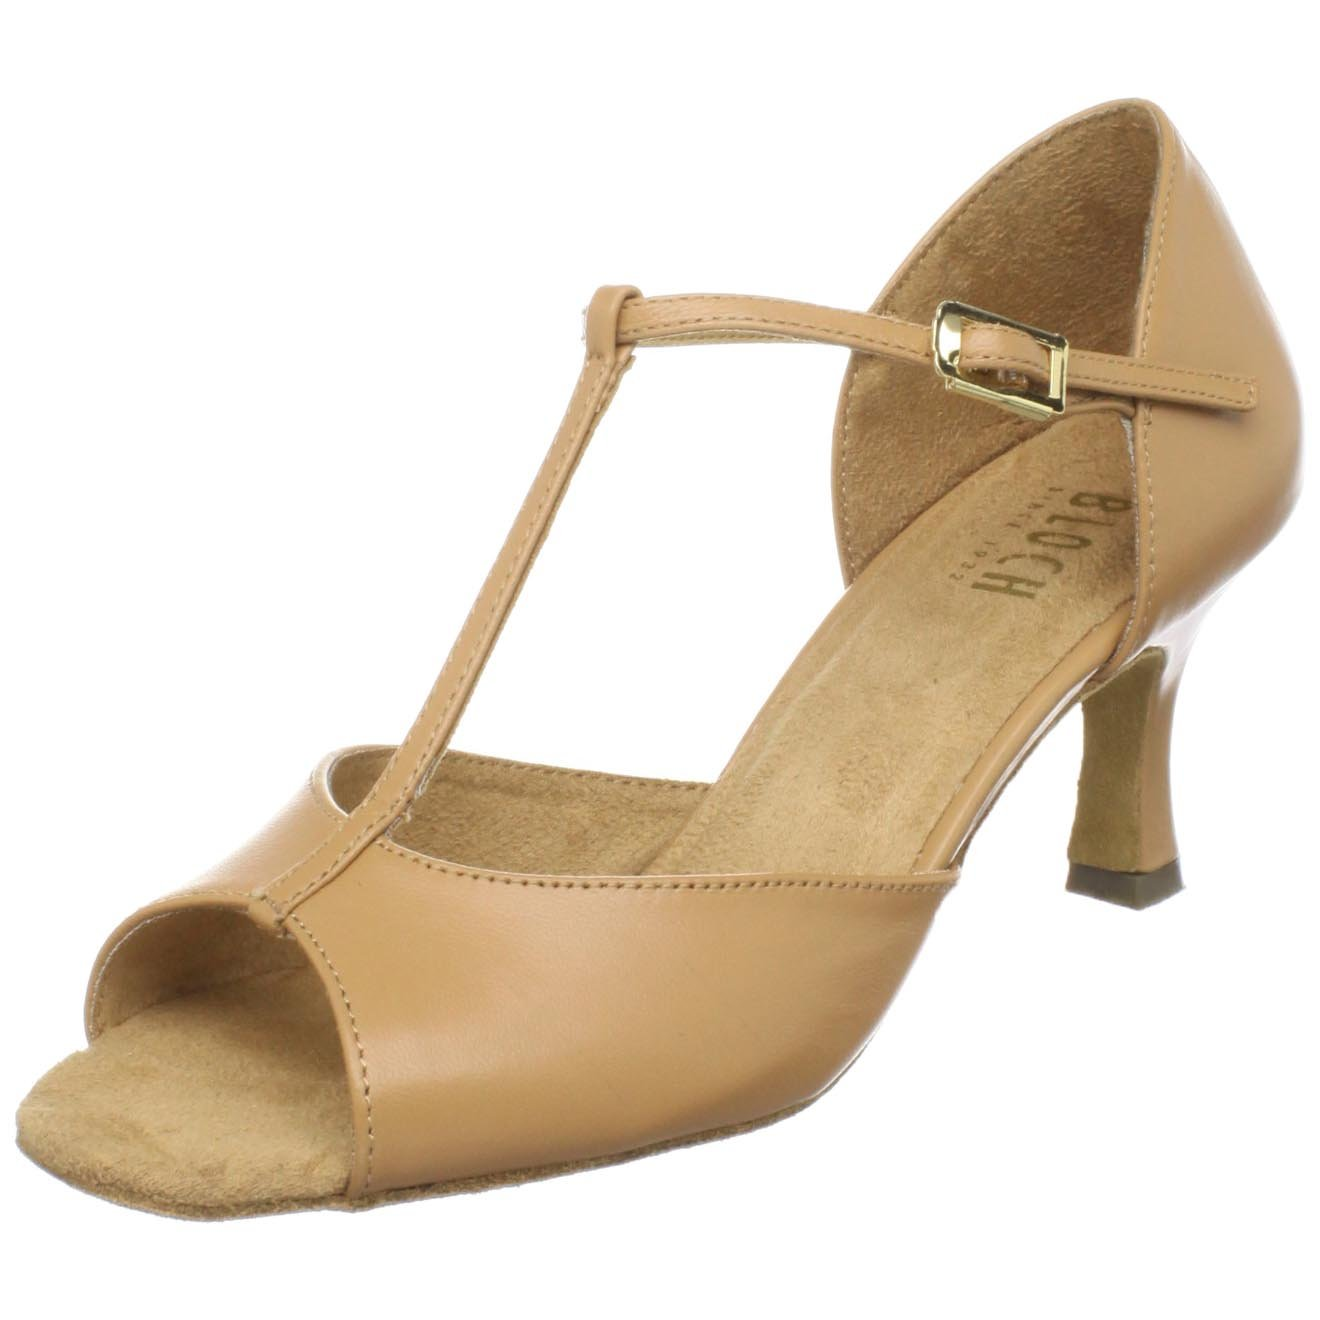 Image of Bloch Dance Women's Illeana Leather Latin/Salsa/Ballroom Competition Dance Shoe Ballet & Dance